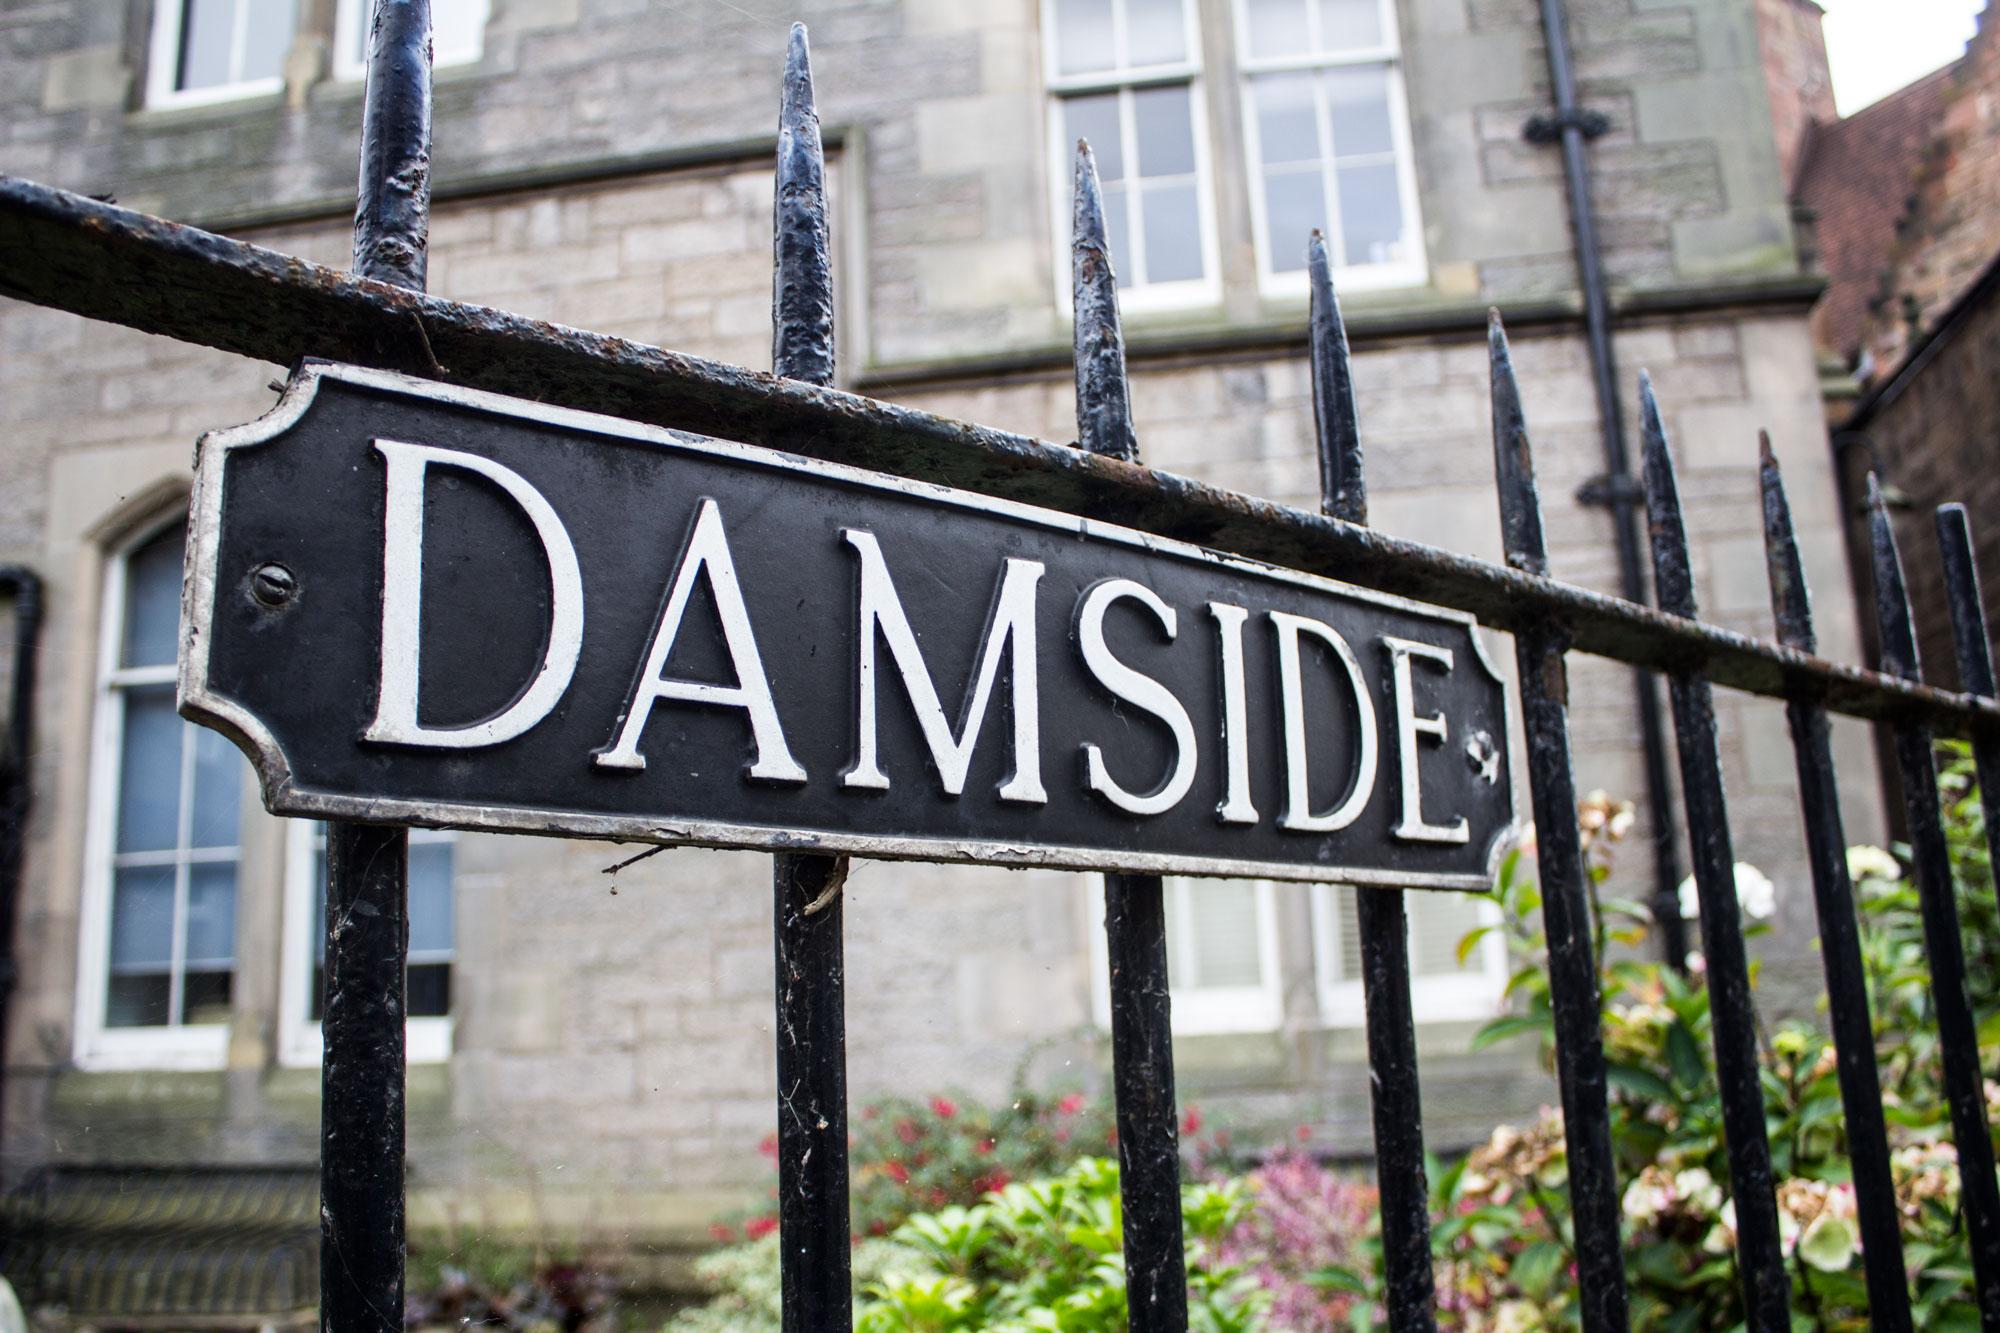 Edinburgh Dean Village